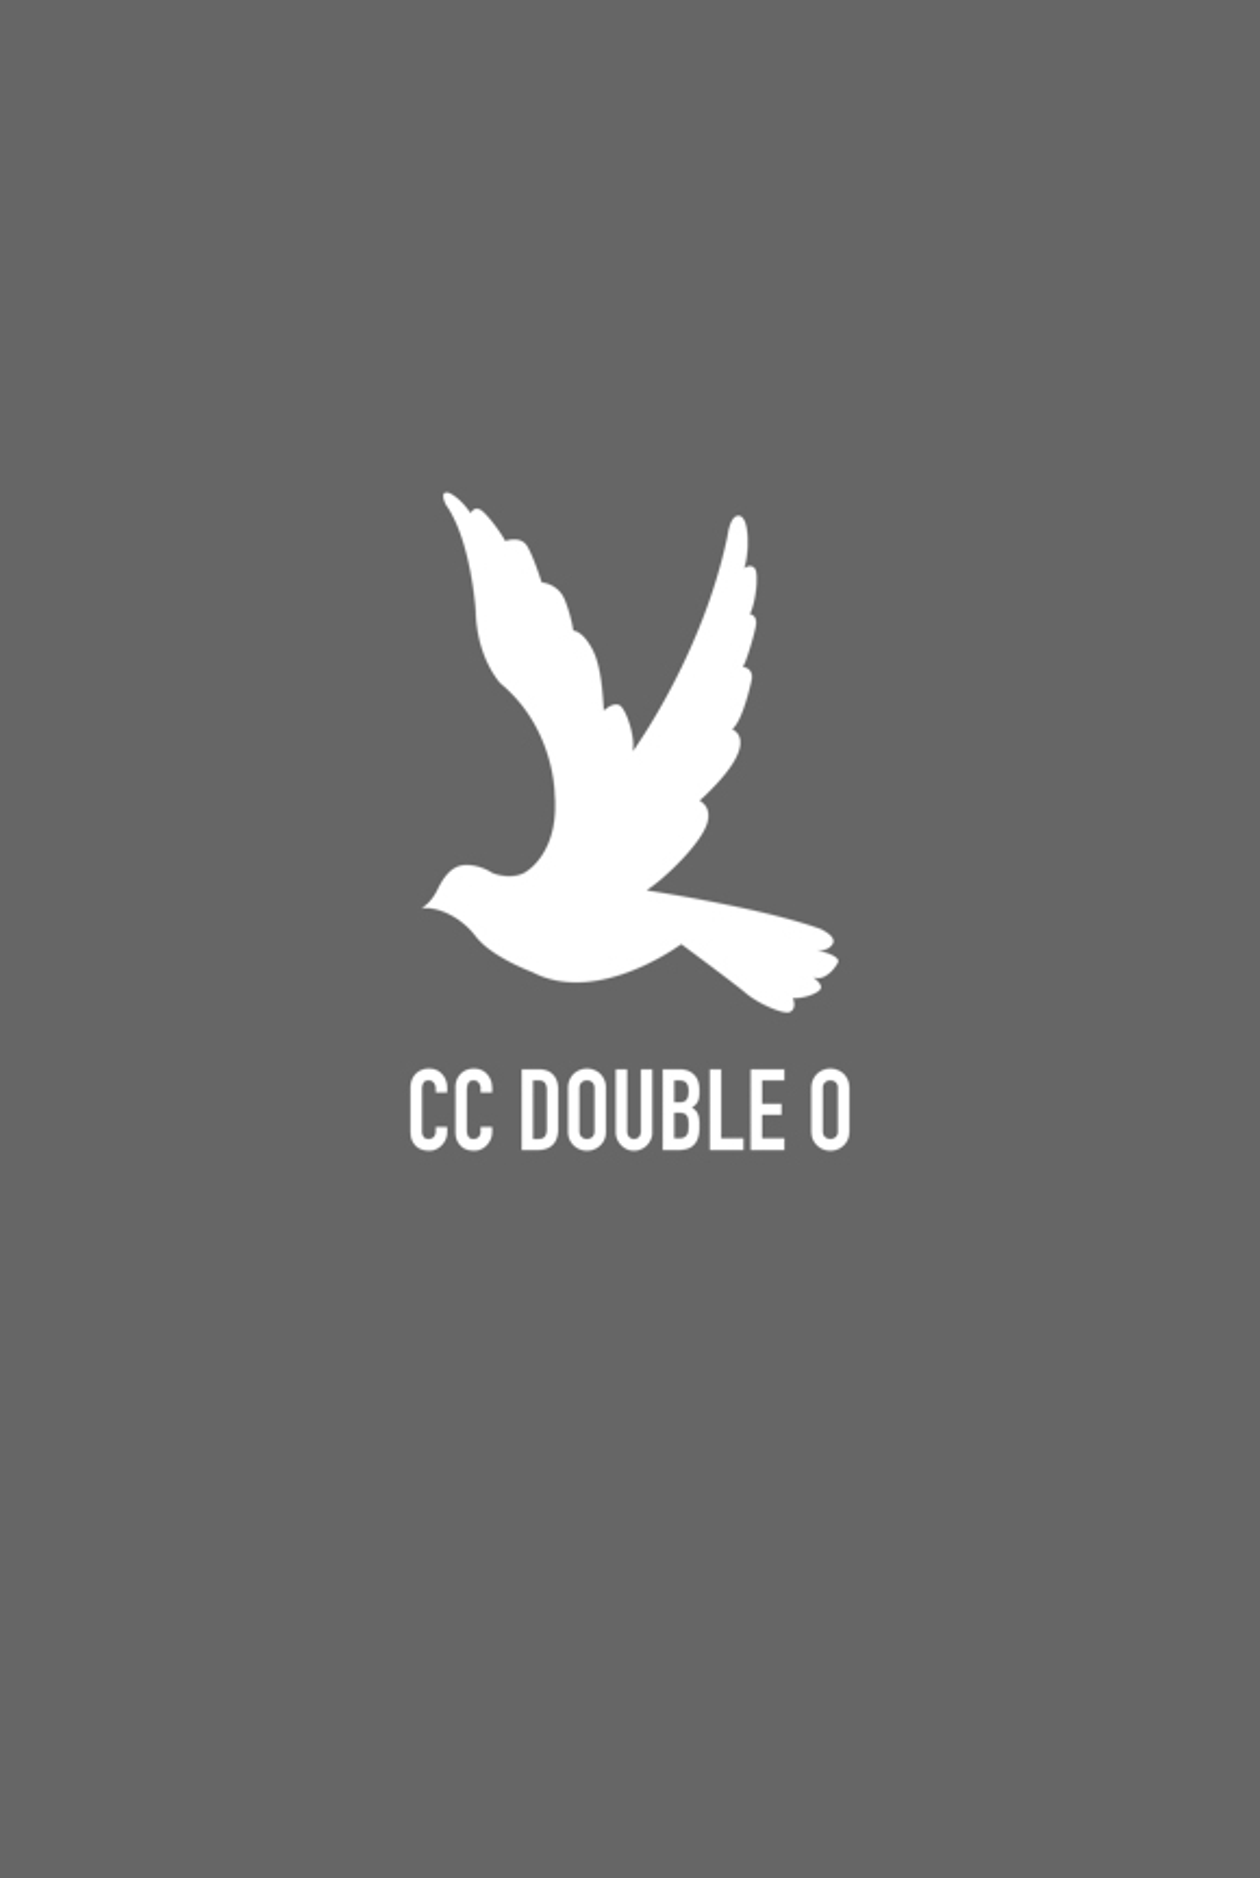 CC DOUBLE O Long Envelope Wallet